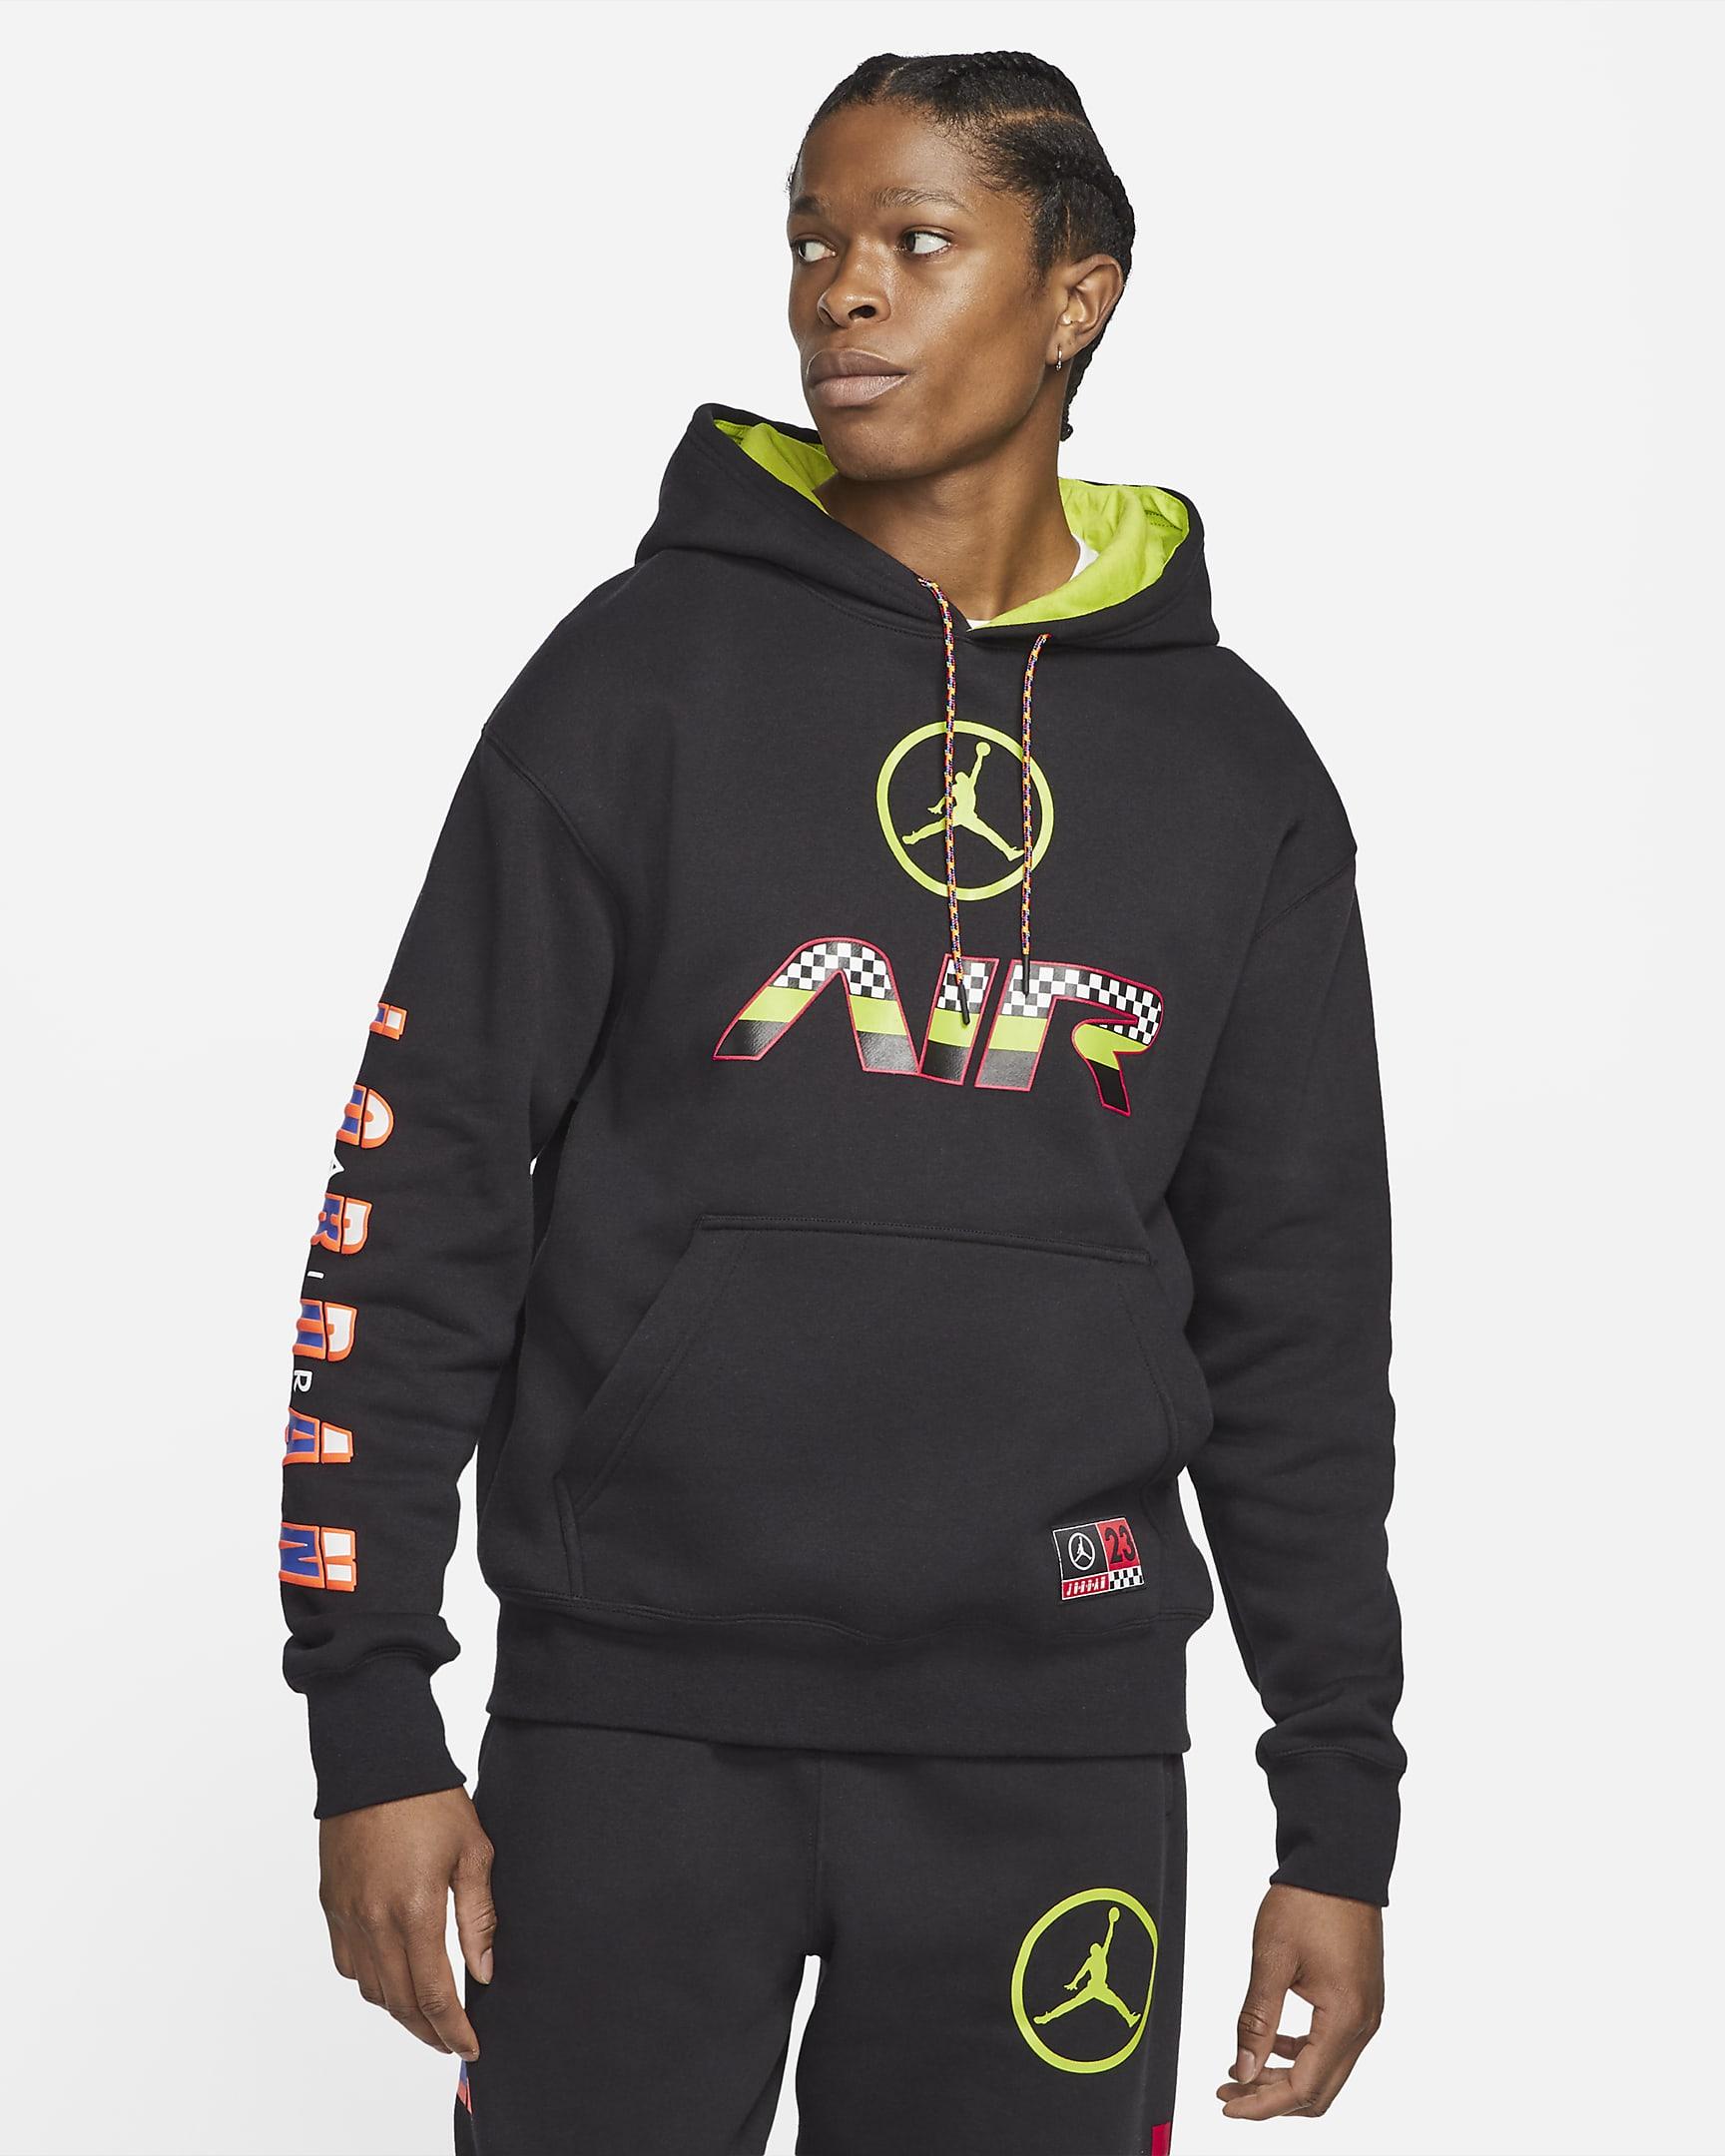 jordan-sport-dna-mens-hbr-pullover-hoodie-1SFRQ0